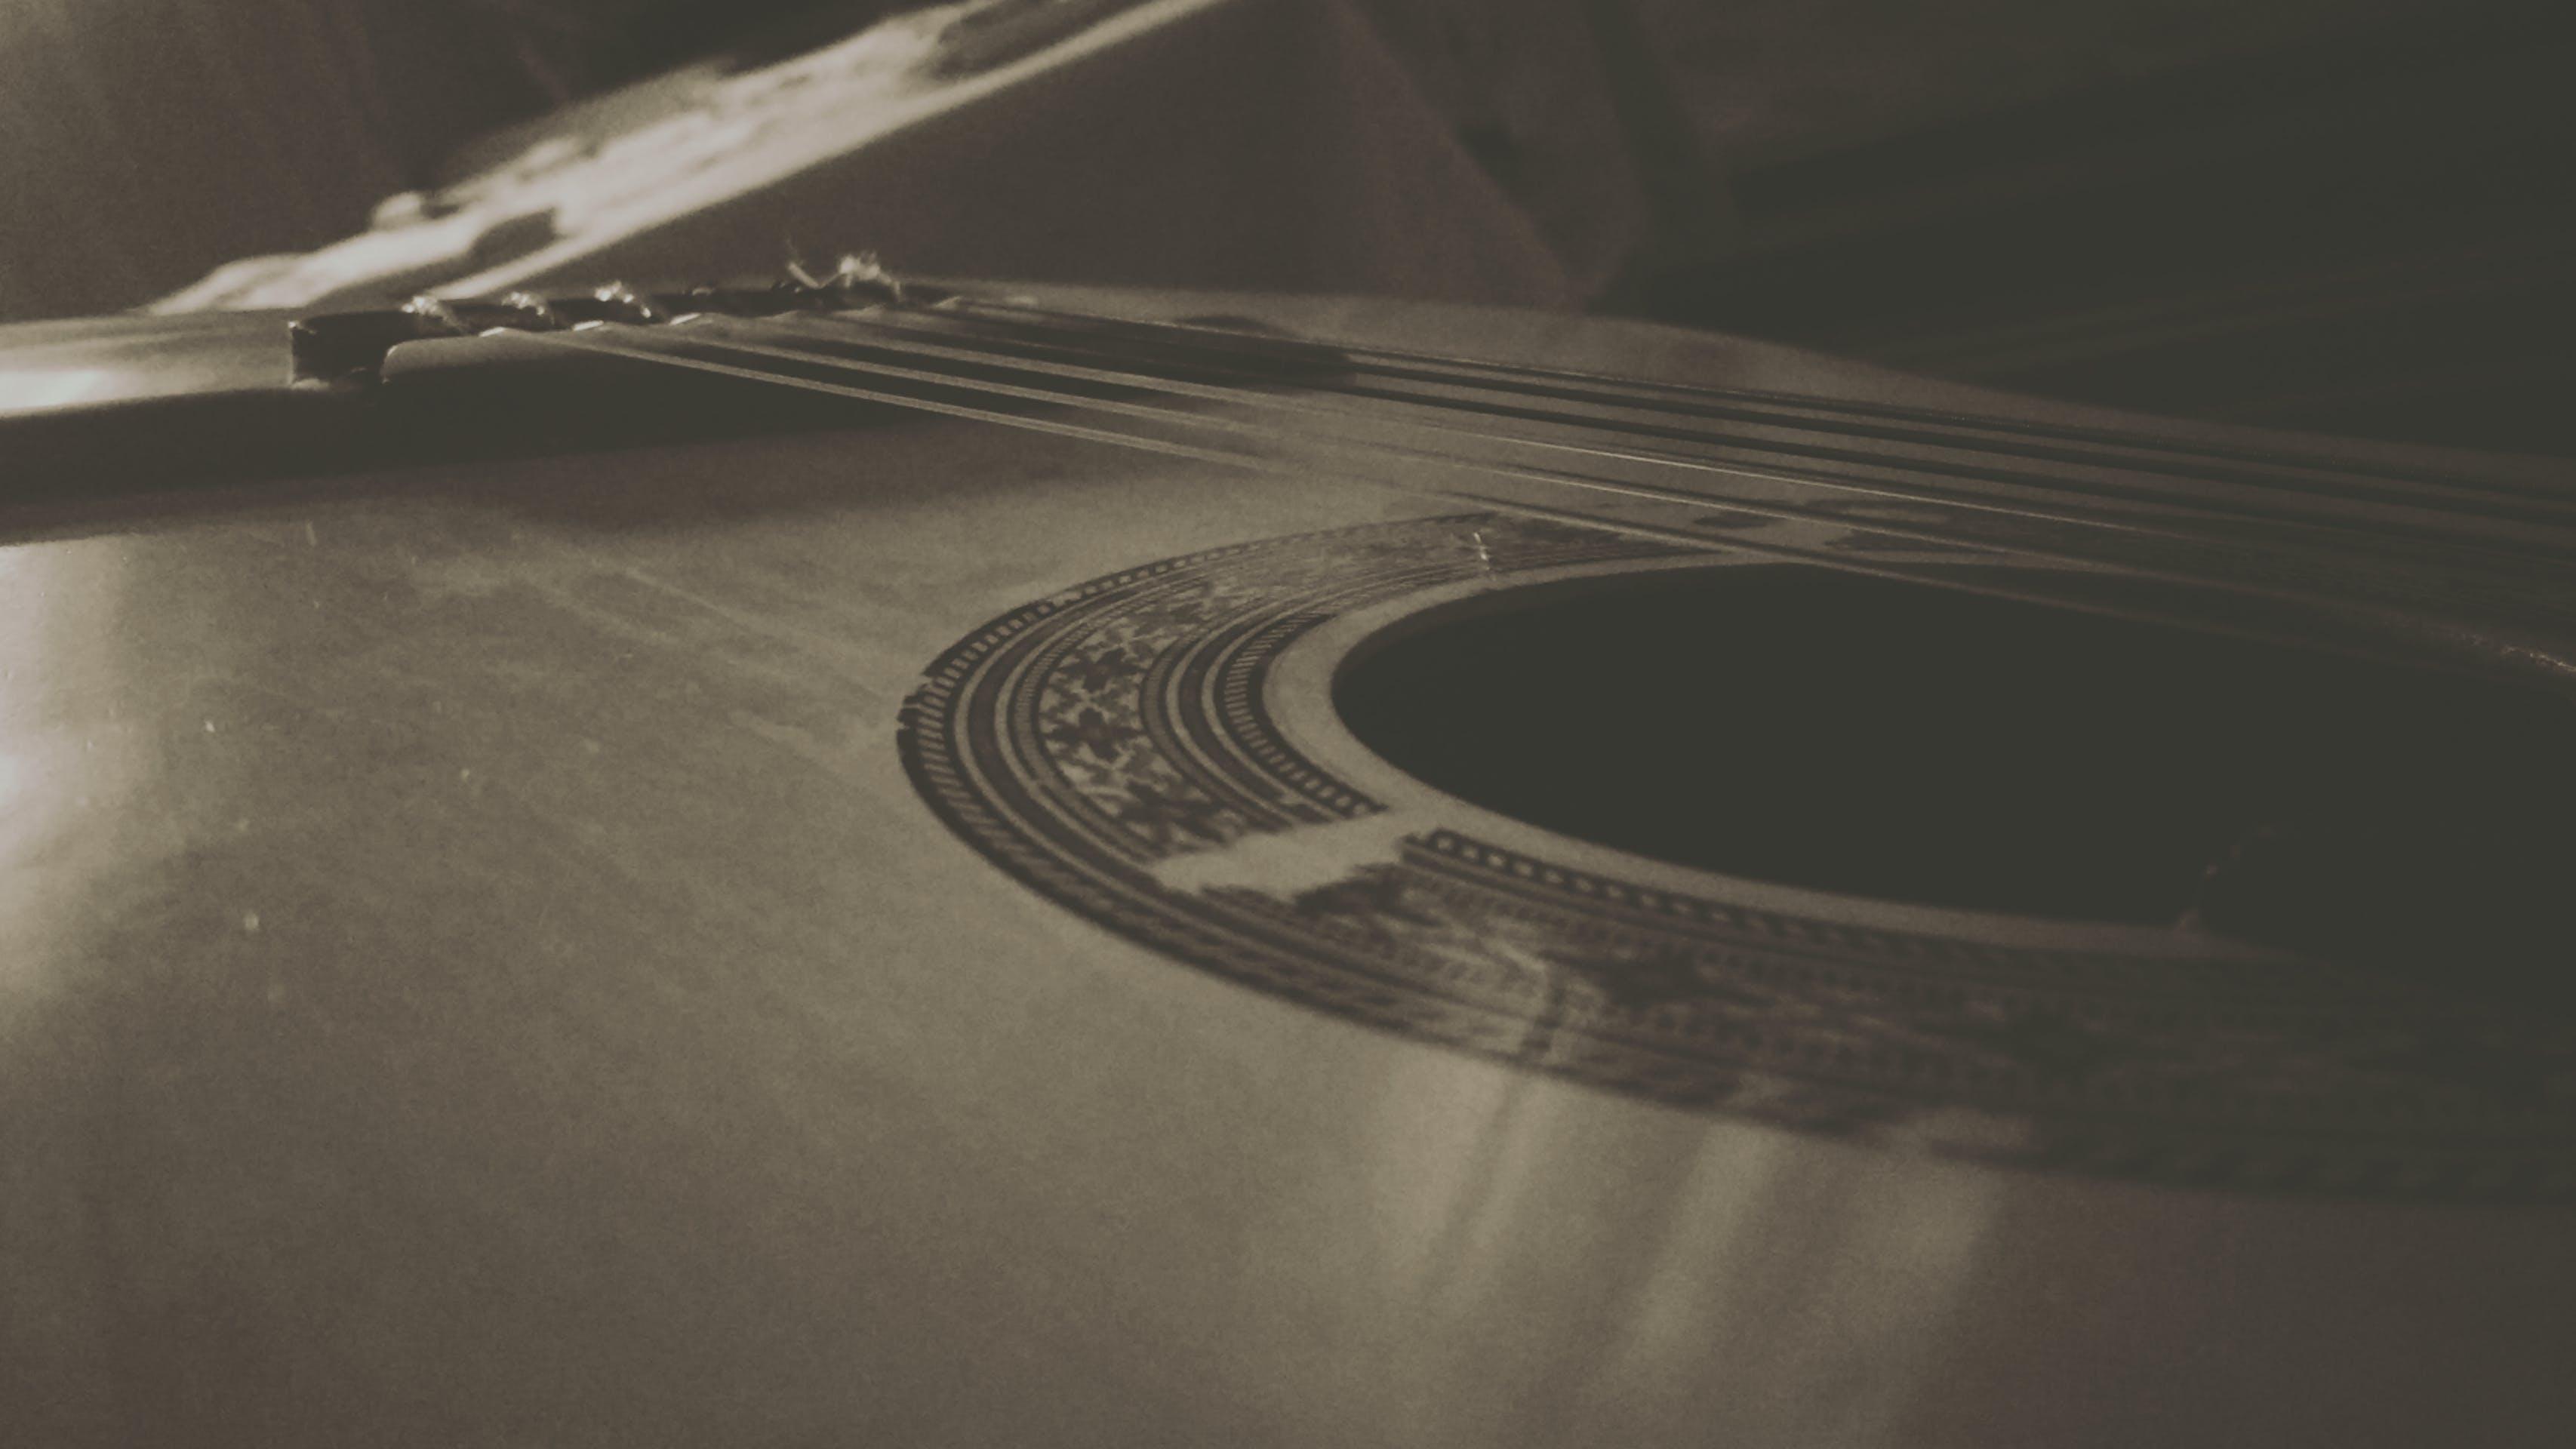 Free stock photo of classical guitar, classical music, guitare, guitarist